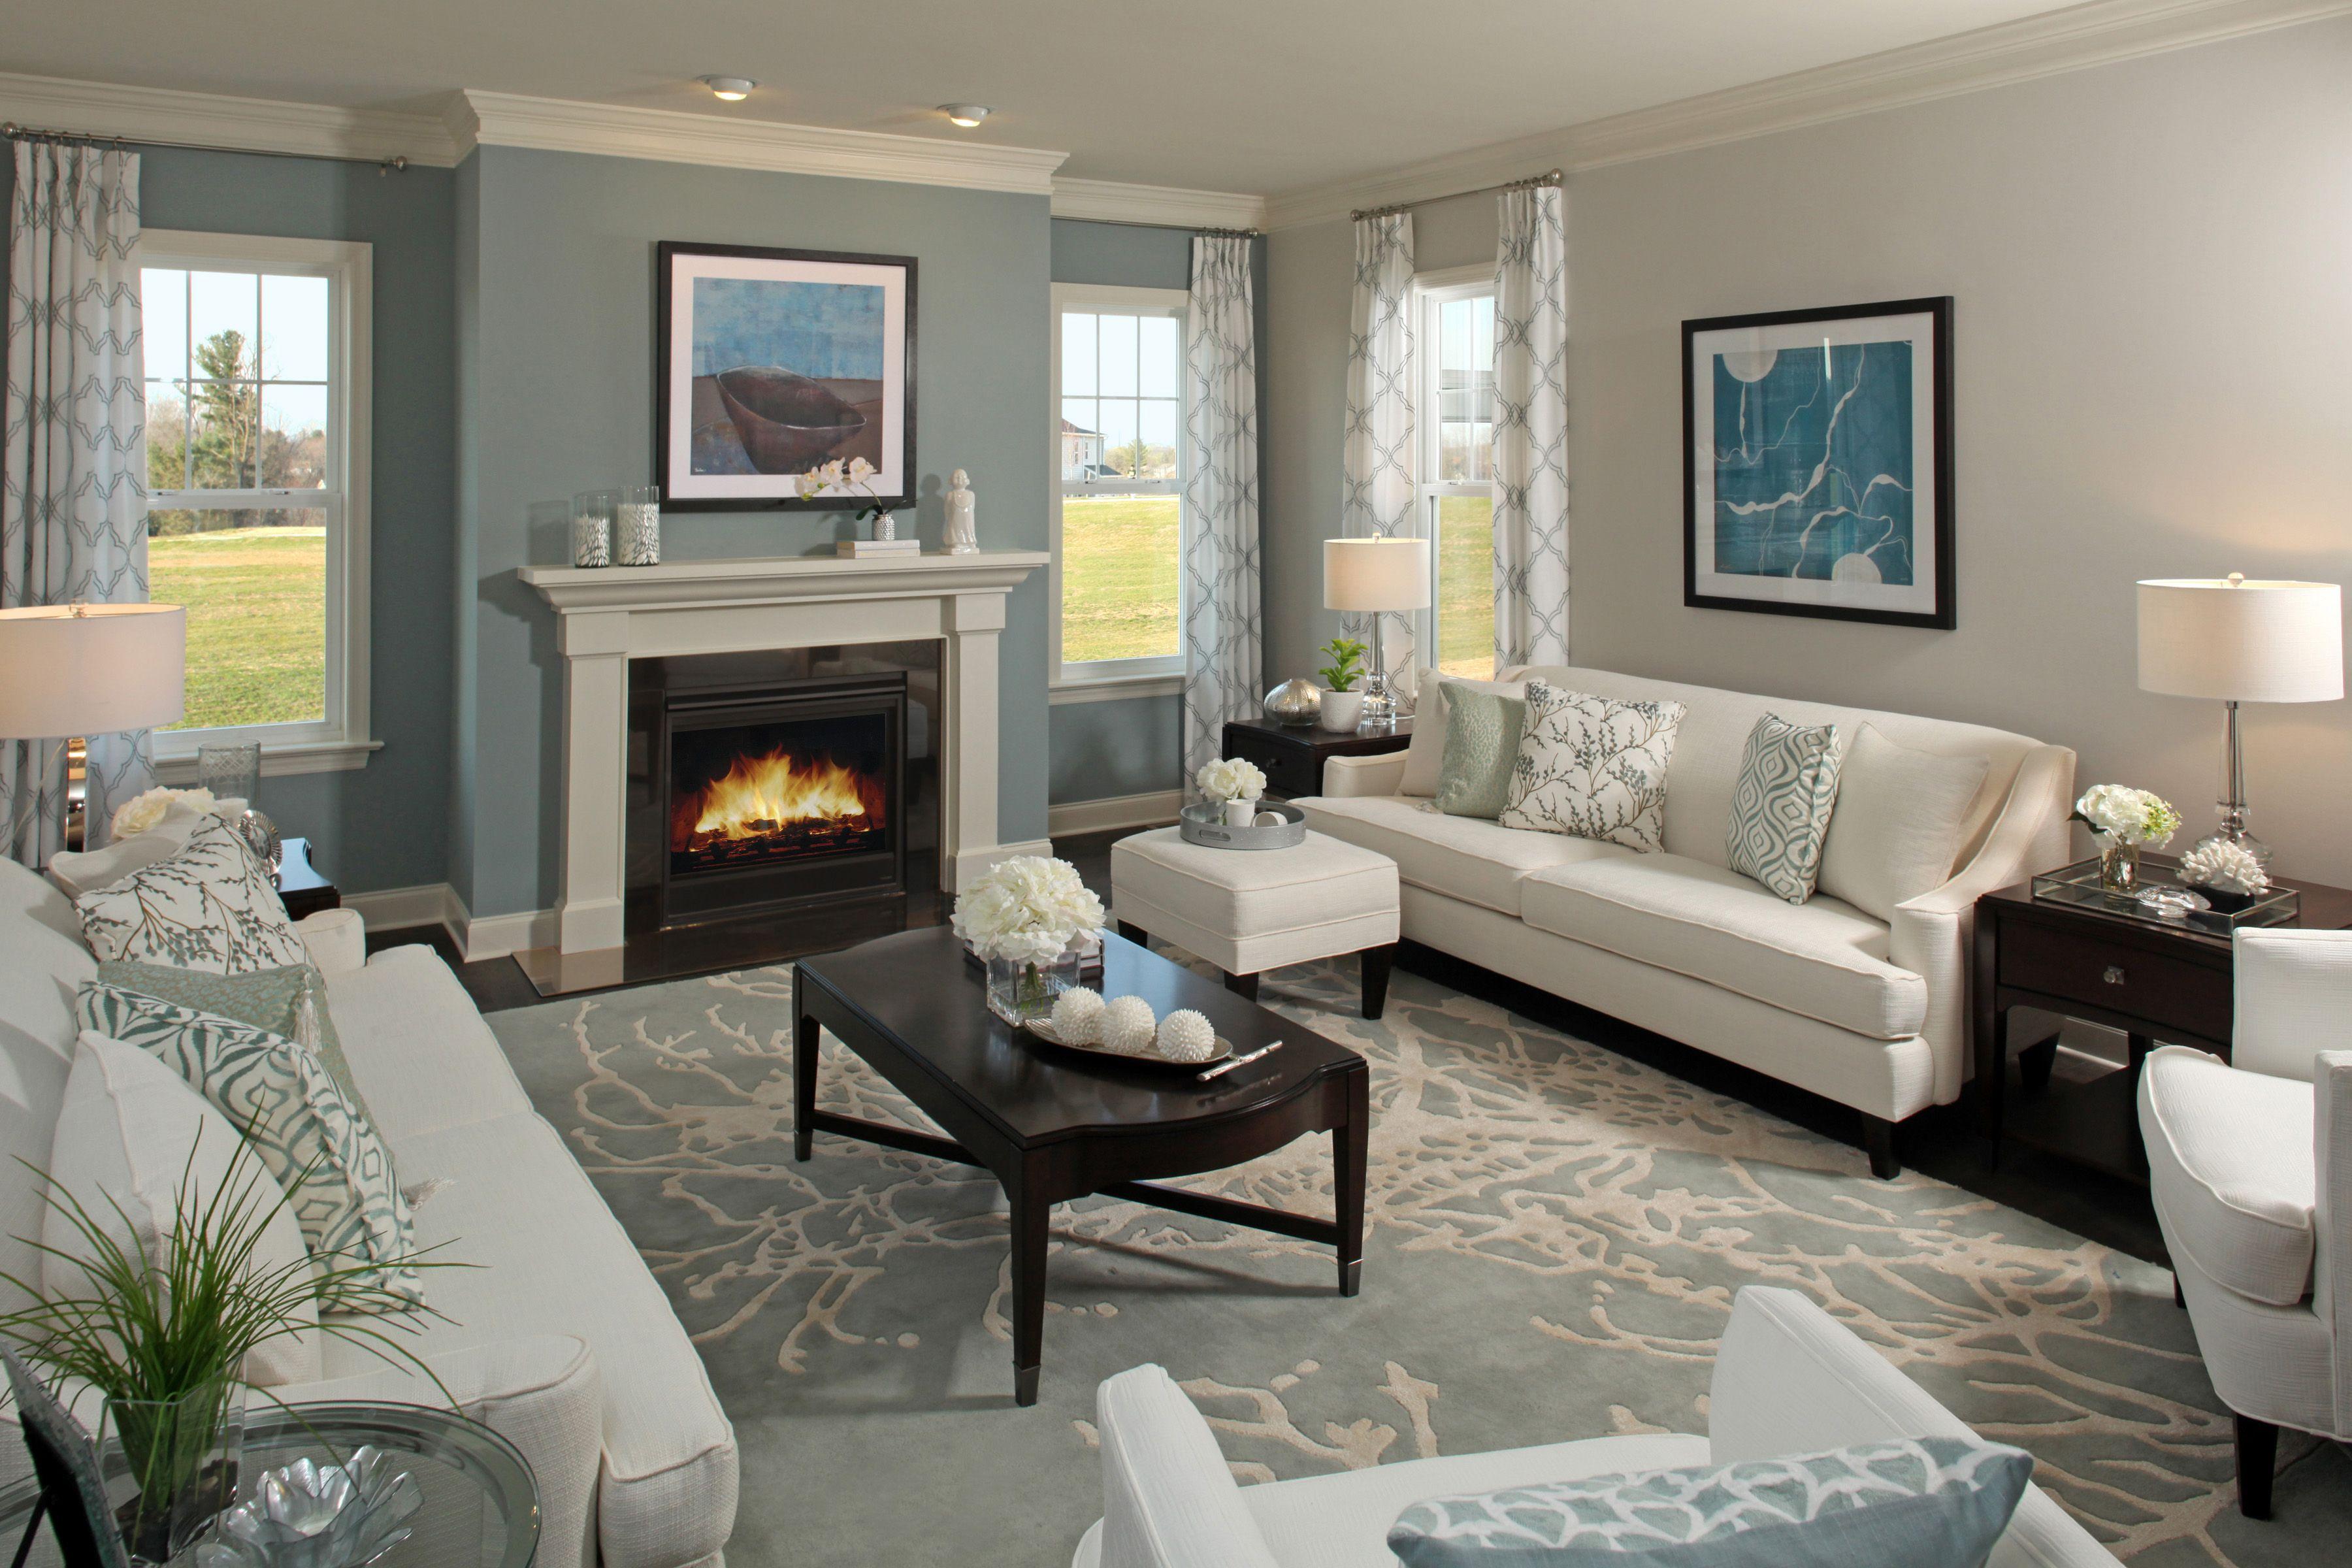 Design homes llc of pa - Home design